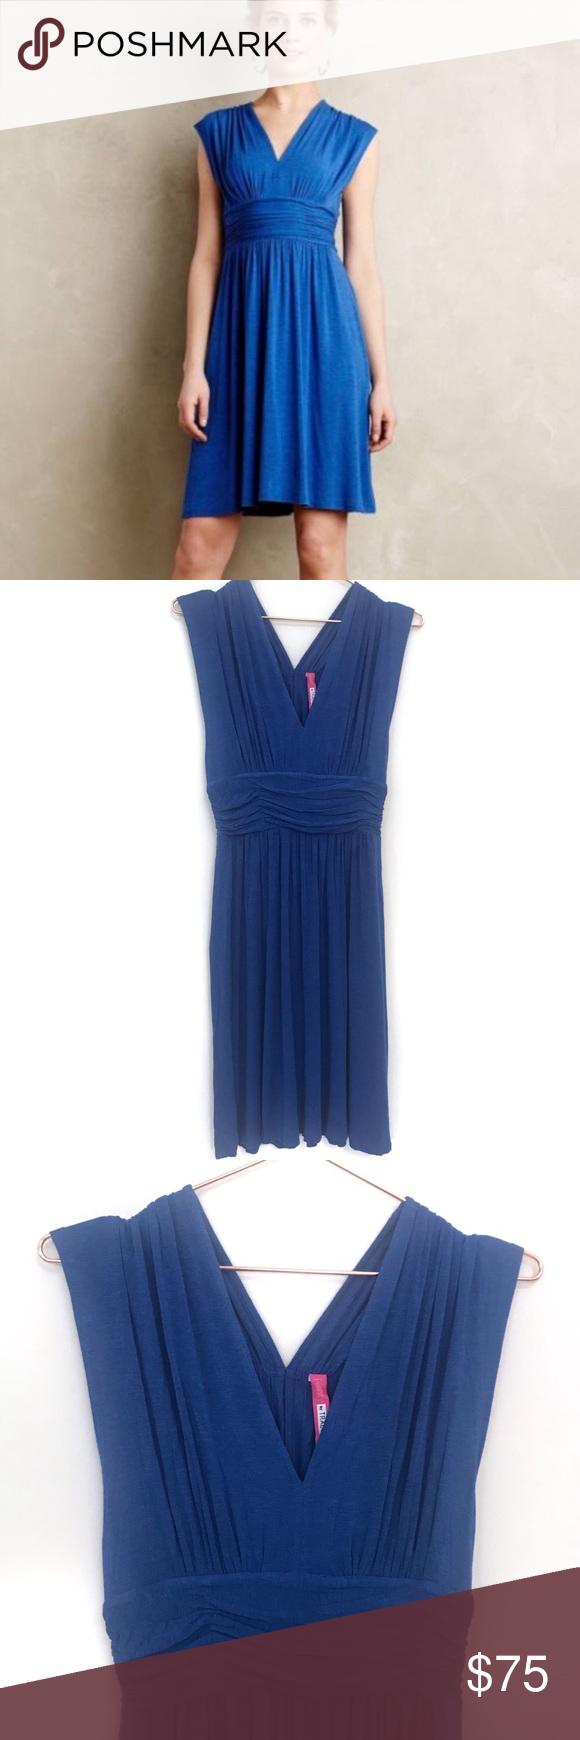 "6fa85c445b Anthropologie Plenty by Tracy Reese Niki Dress Plenty by Tracy Reese for  Anthropologie sleeveless ""Niki"" dress in blue. Hidden back zipper closure  with ..."